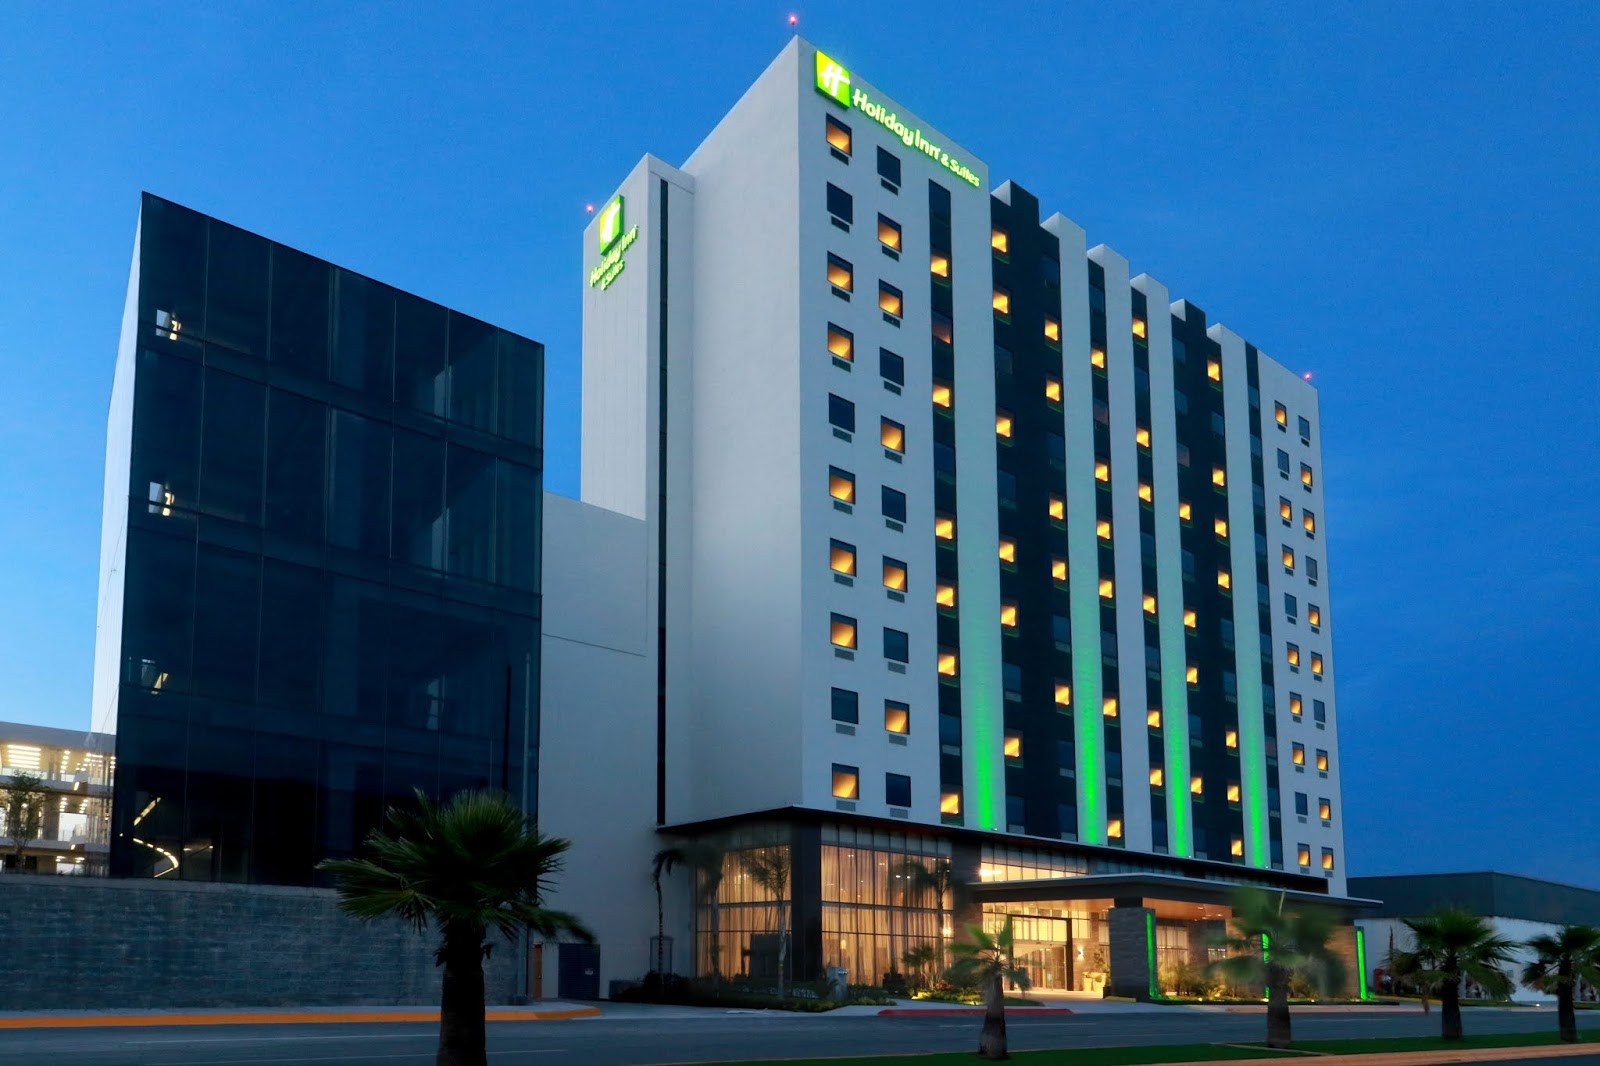 HOTEL IHG HOLIDAY INN MONTERREY APODACA 1